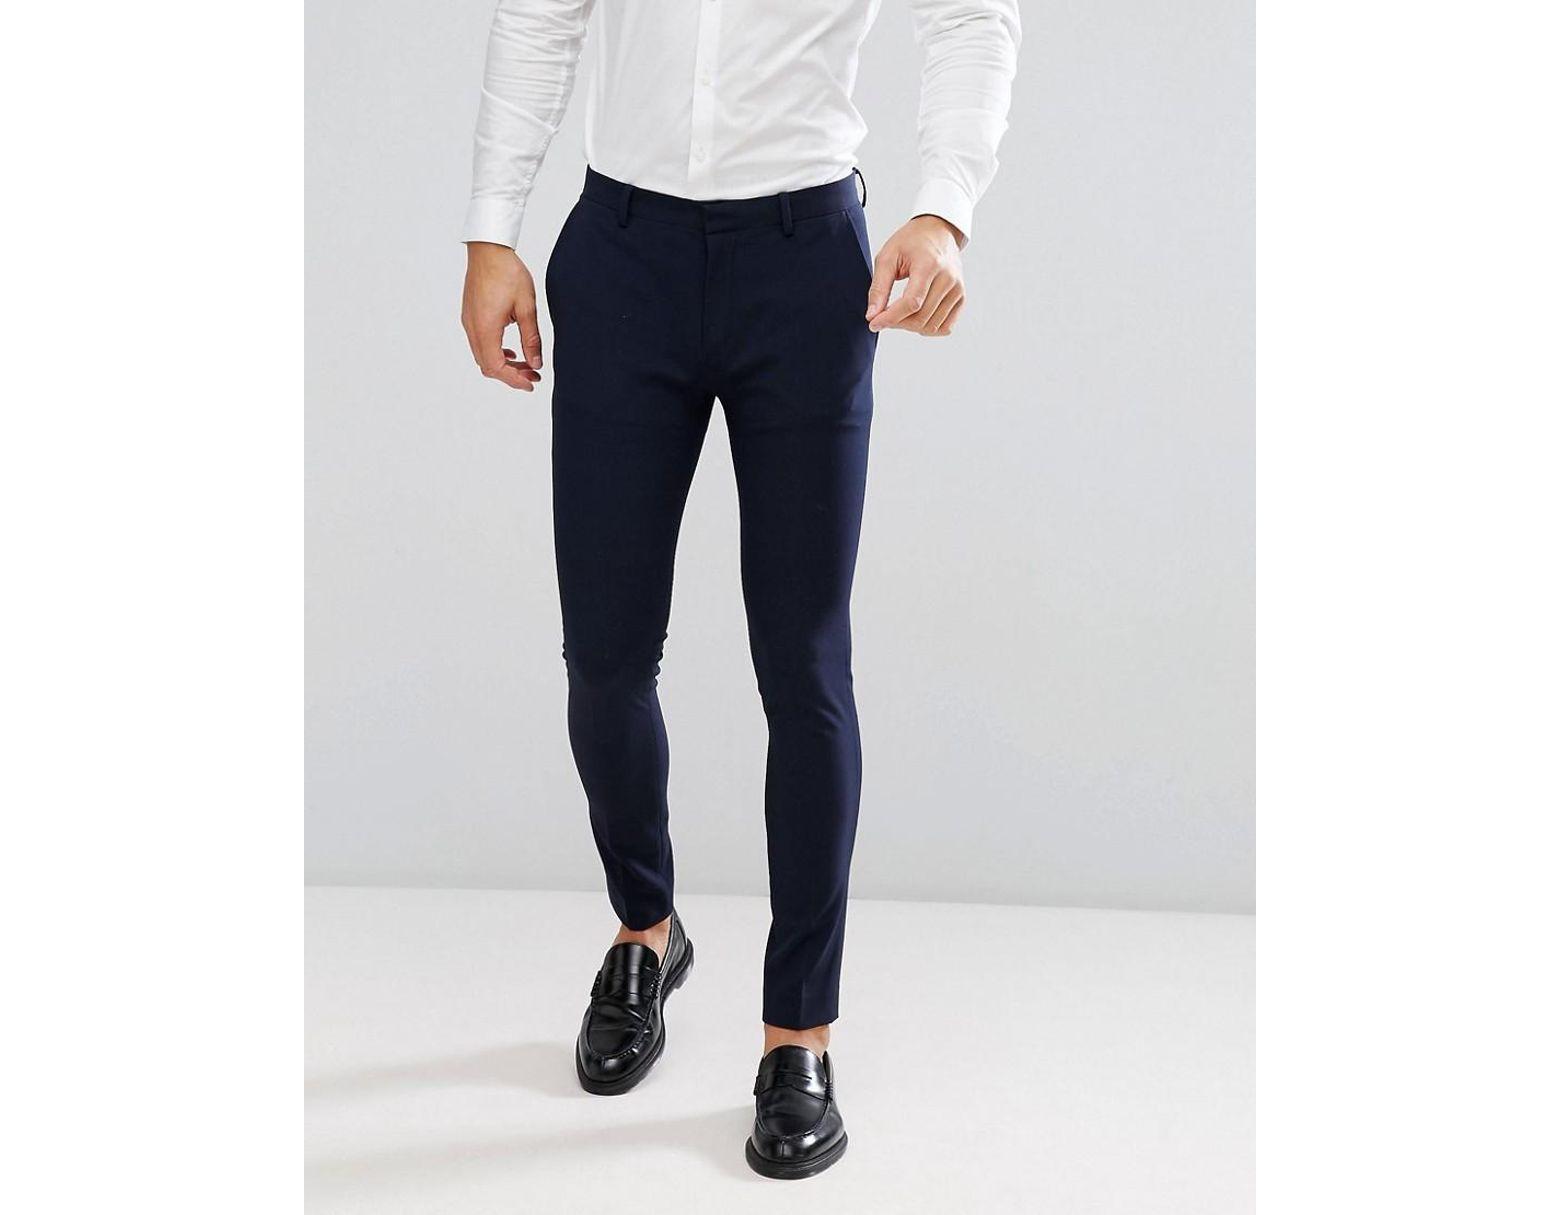 Bleu Marine Skinny Homme Pantalon De Costume Super BodxeWrC